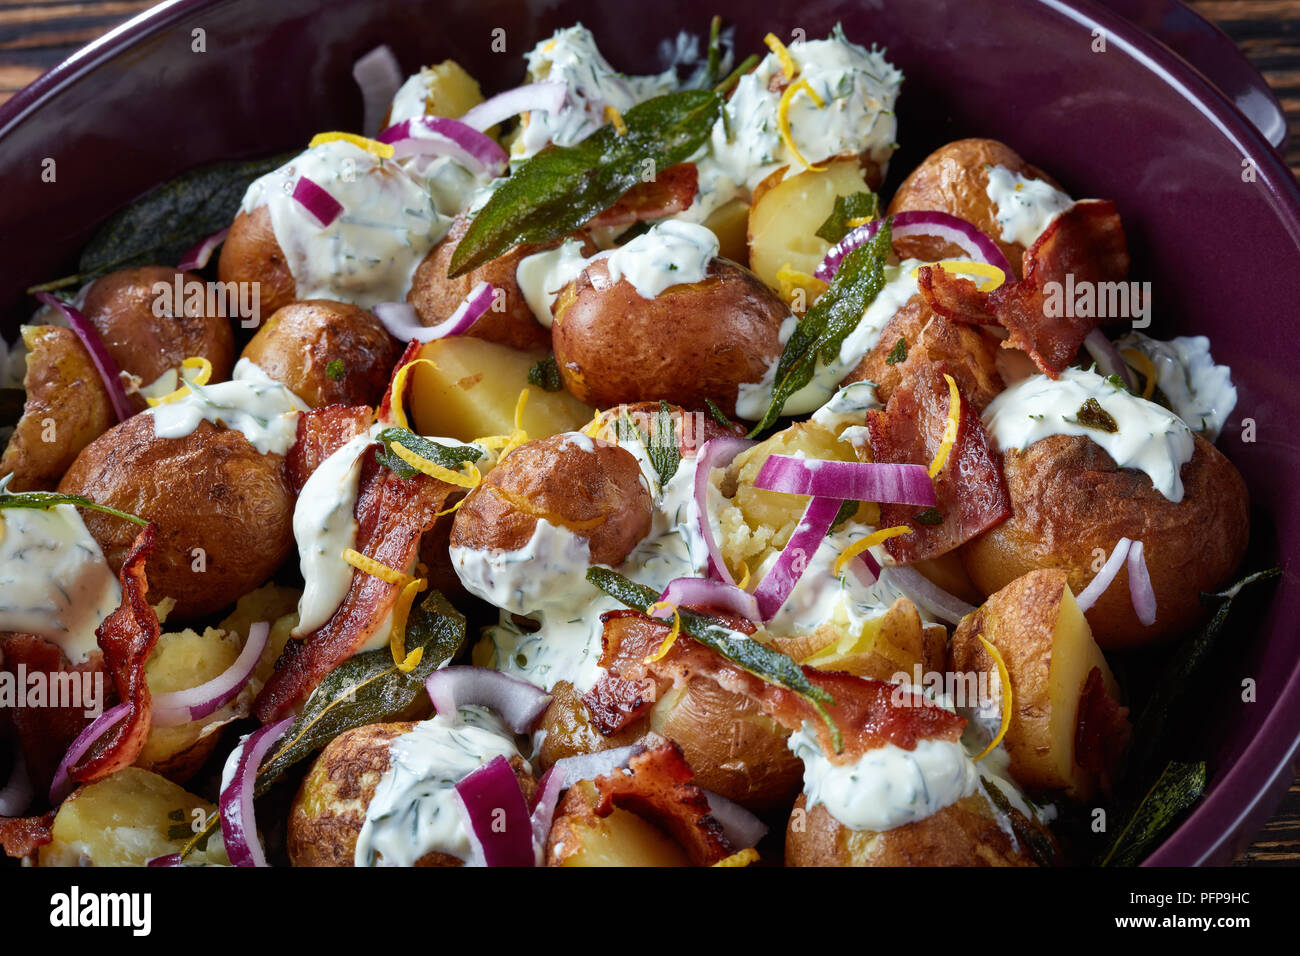 Potato Salad With Greek Yogurt And Bacon